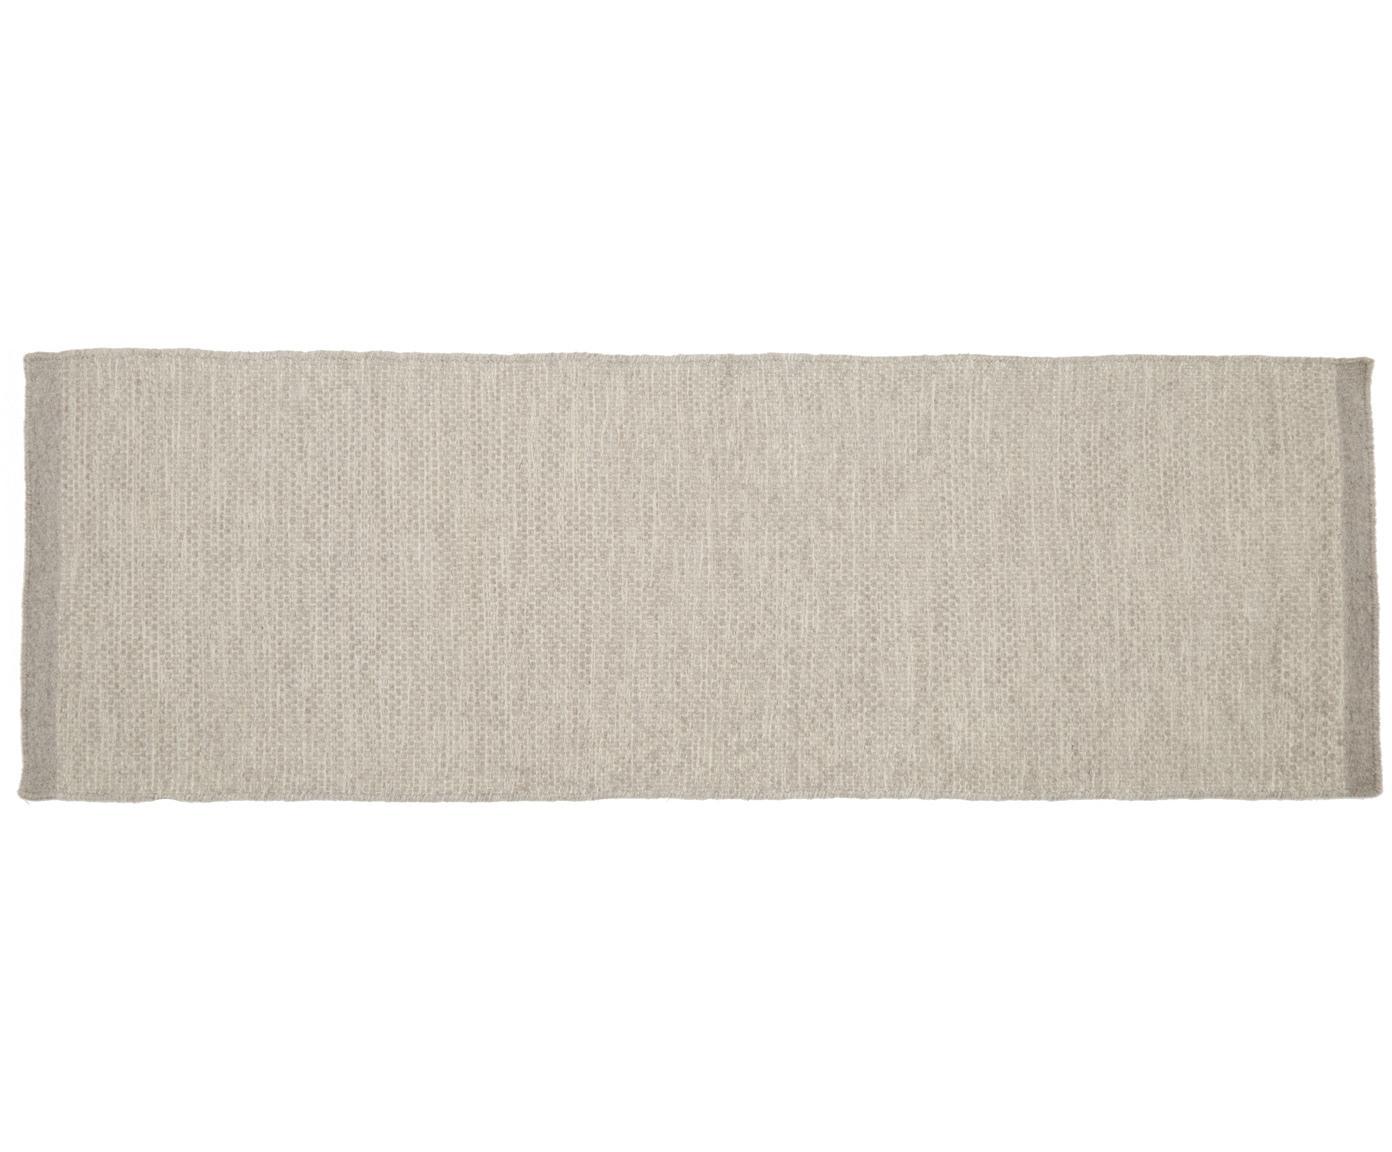 Alfombra kilim artesanal de lana Delight, Parte superior: 90%lana, 10%algodón, Reverso: algodón, Gris claro, An 80 x L 250 cm